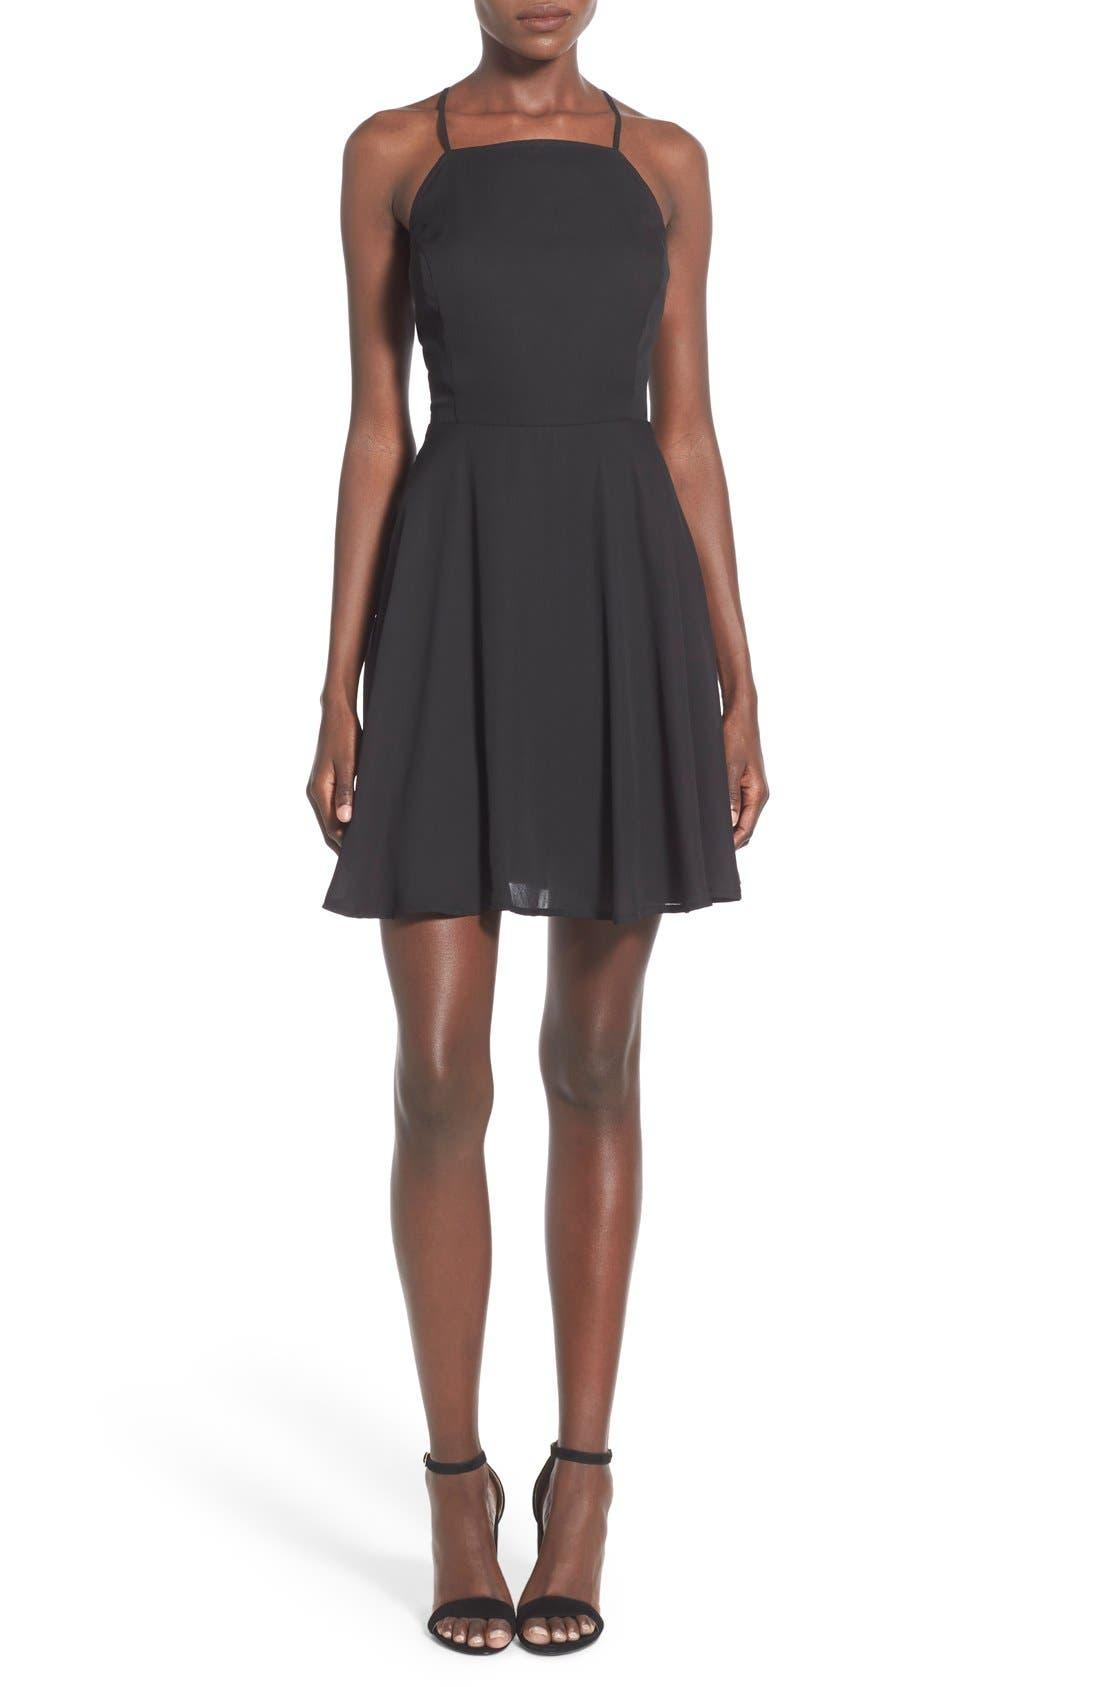 Alternate Image 1 Selected - BP. Strappy Back Skater Dress